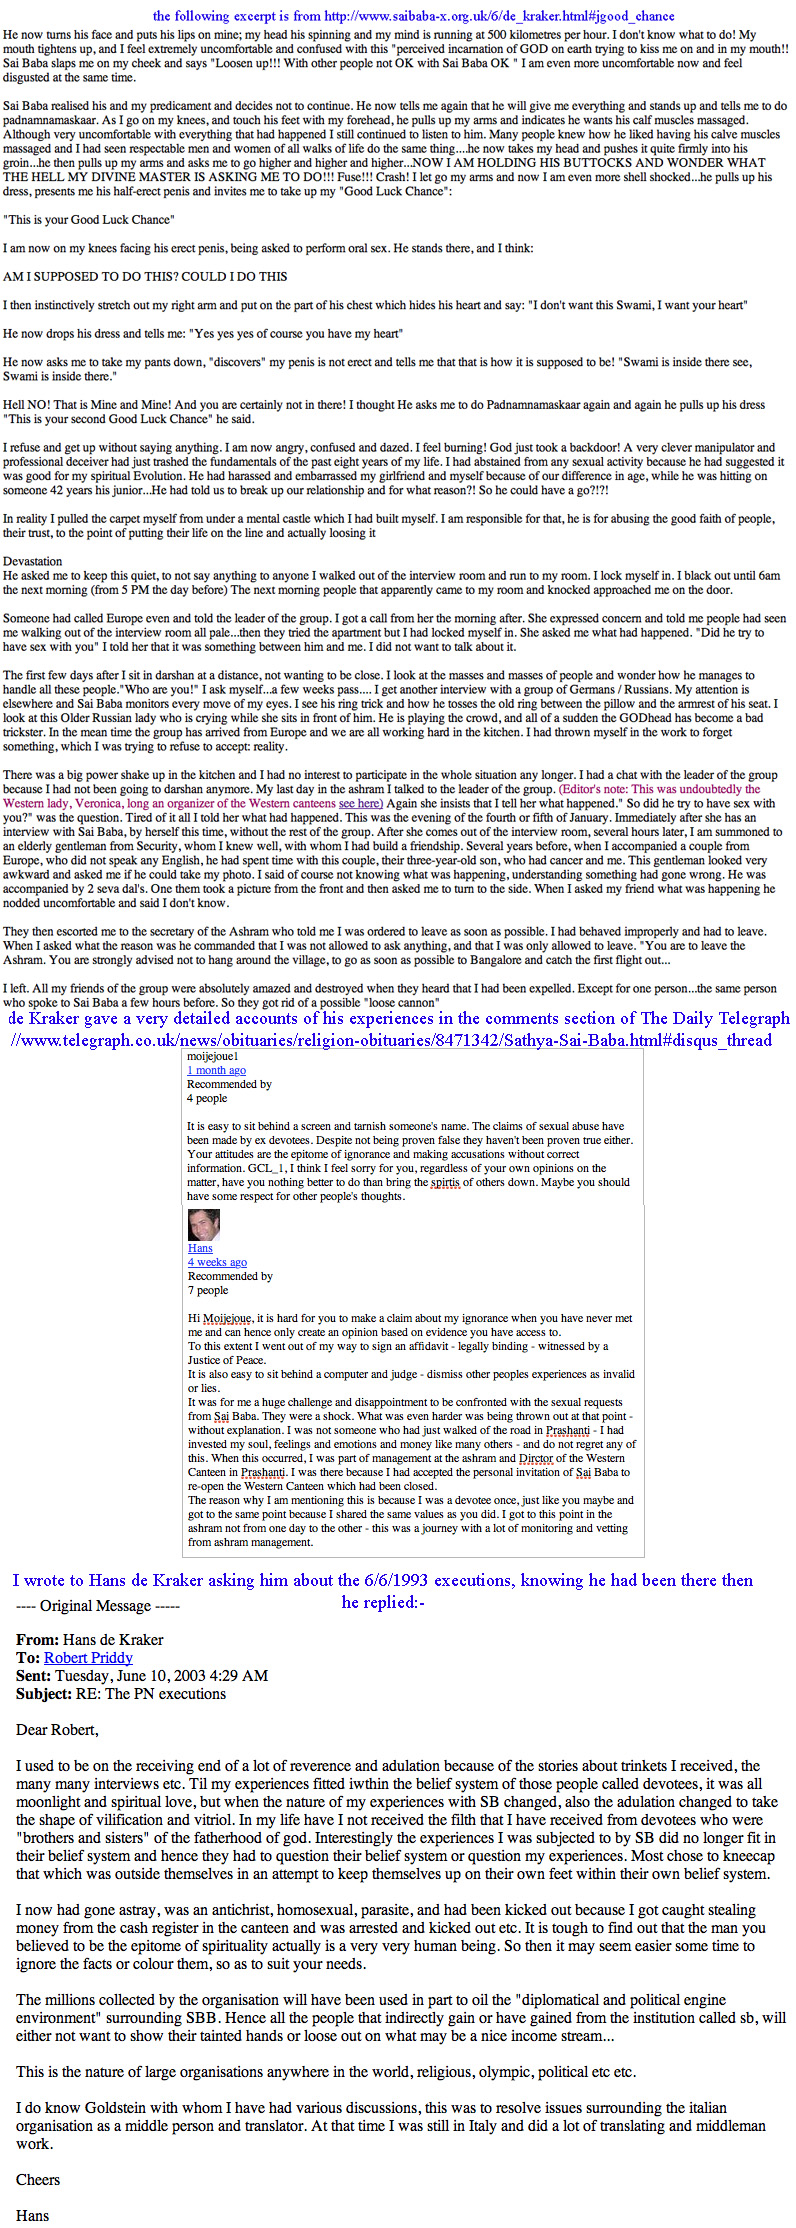 Sathya Sai Baba's discourses: gross falsification by editors | Sai